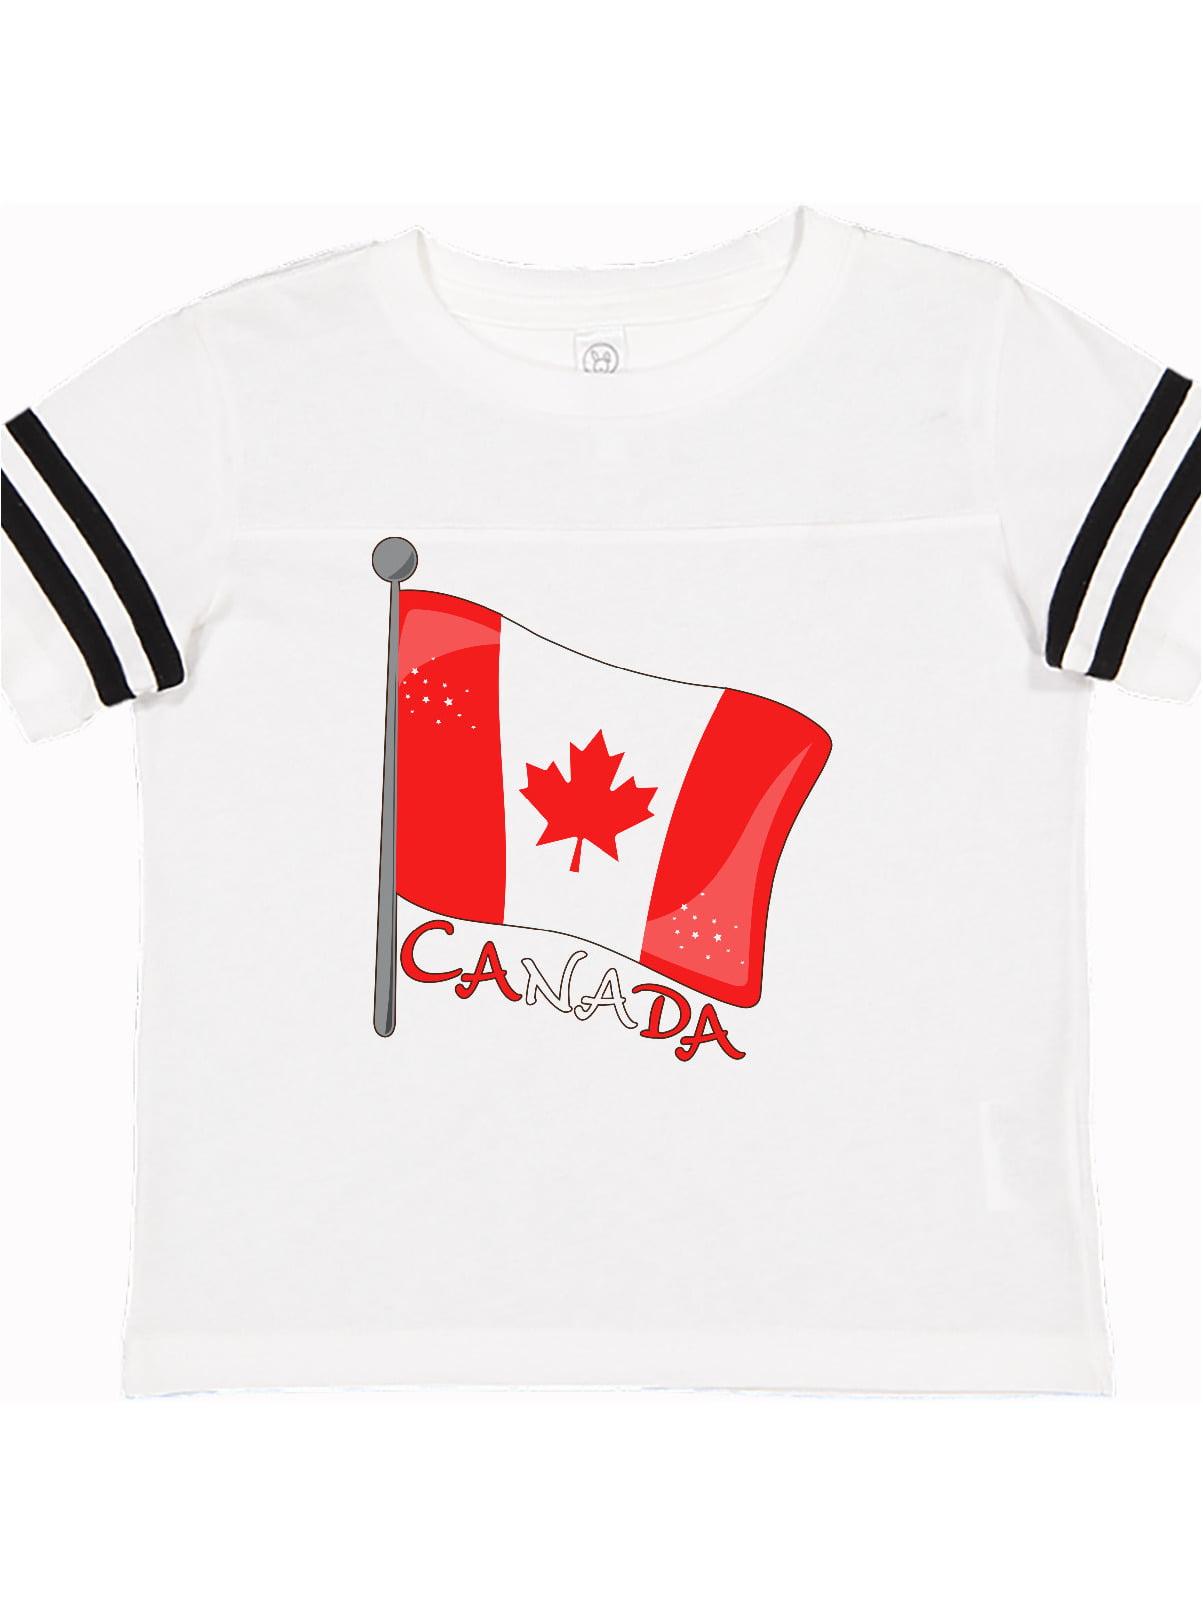 Canada Maple Leaf Baby Boys Girls Short Sleeve Crew Neck T-Shirt